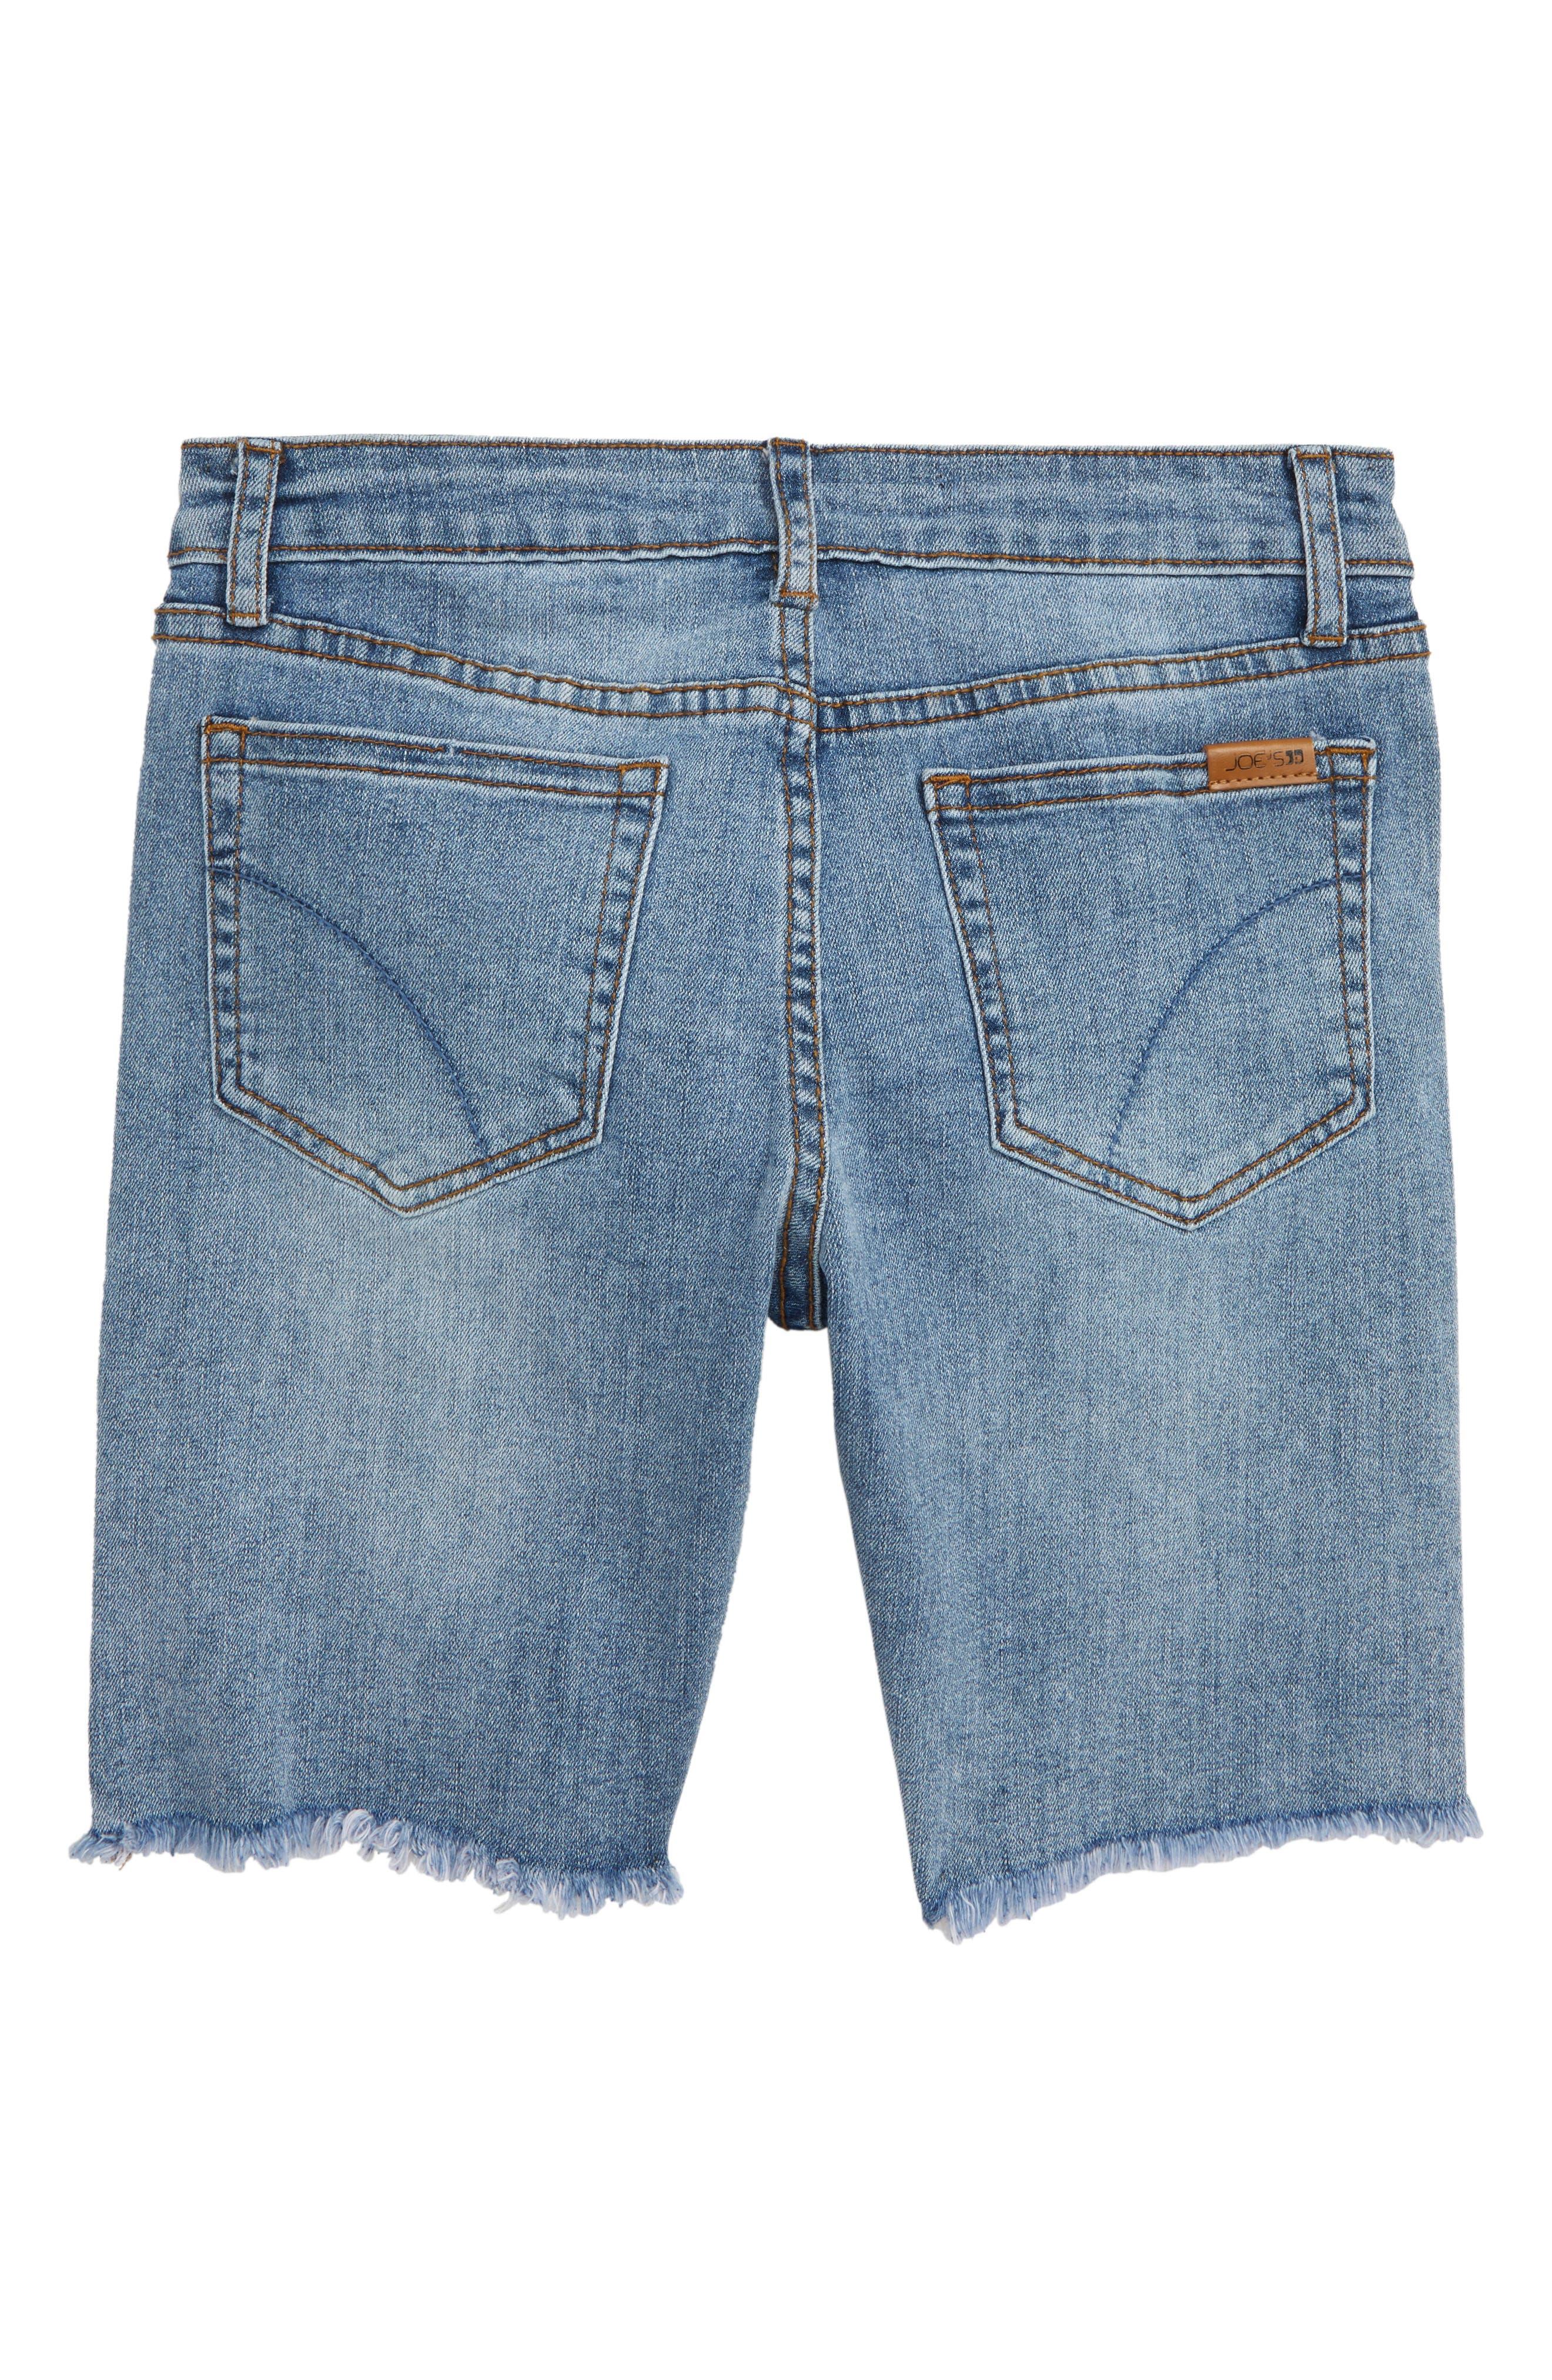 JOE'S, The Finn Cutoff Denim Bermuda Shorts, Alternate thumbnail 2, color, THOMPSON